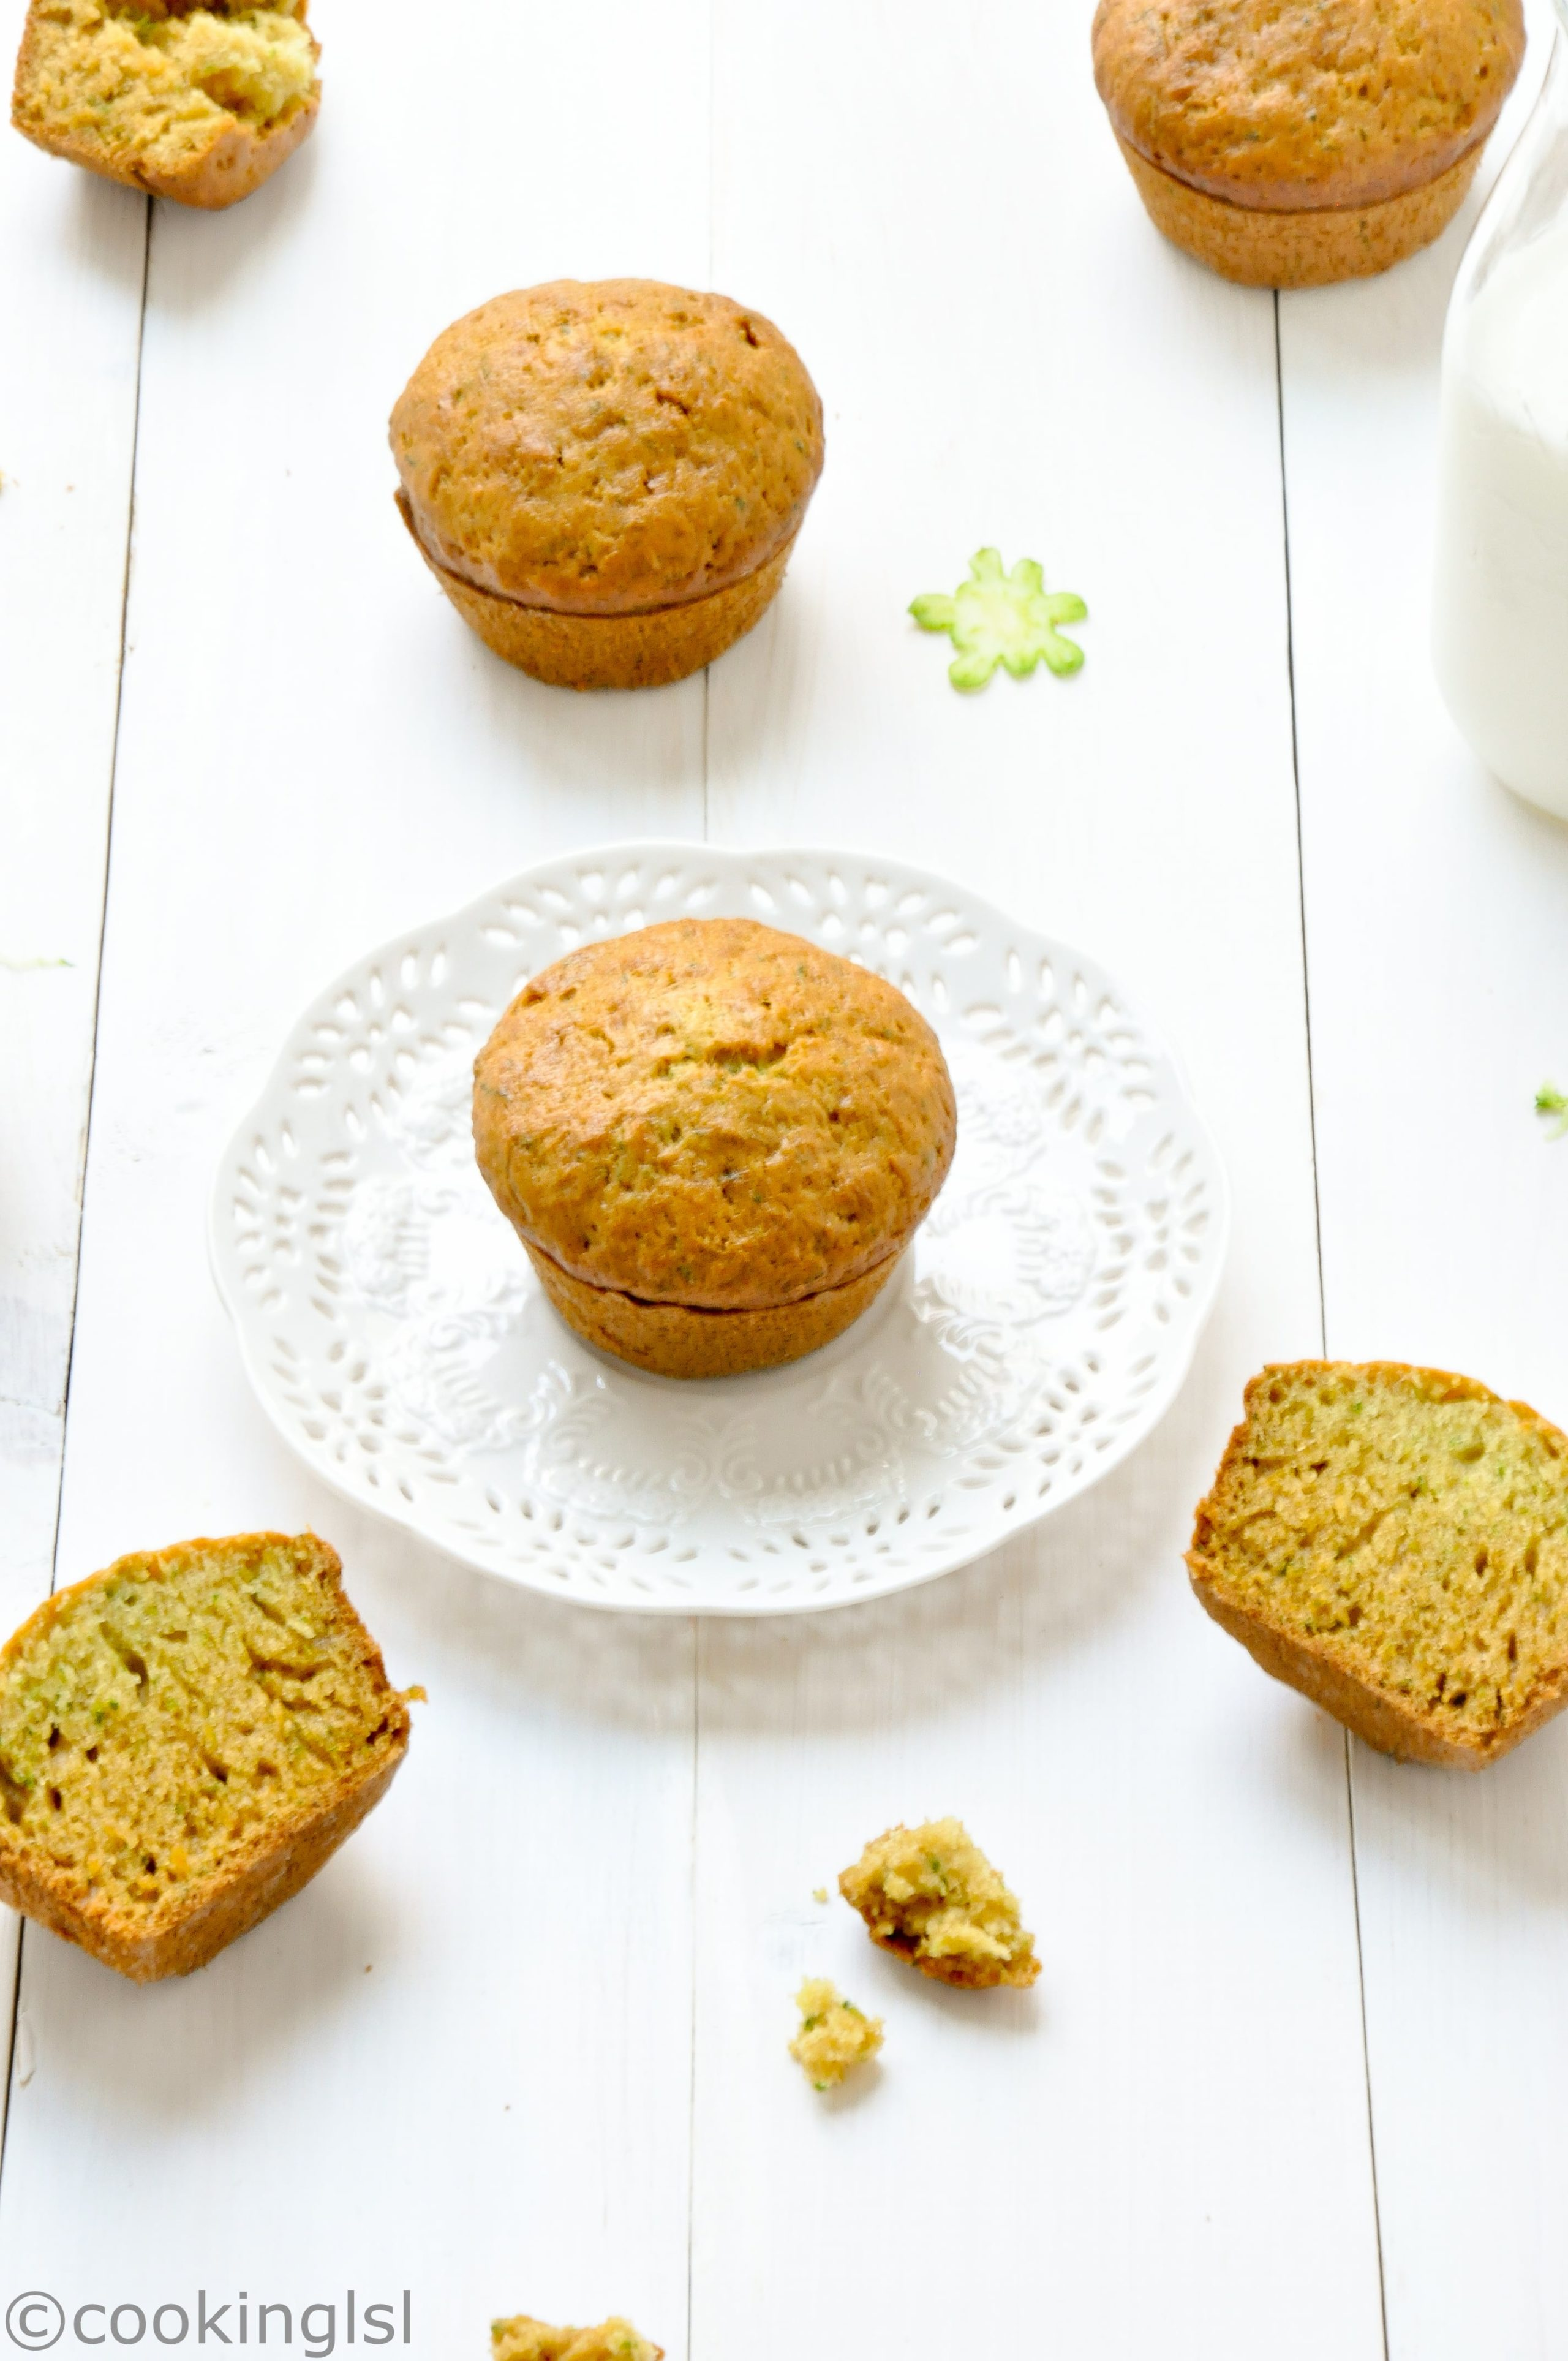 zucchini muffins pinterest 1 of 1 680x1024